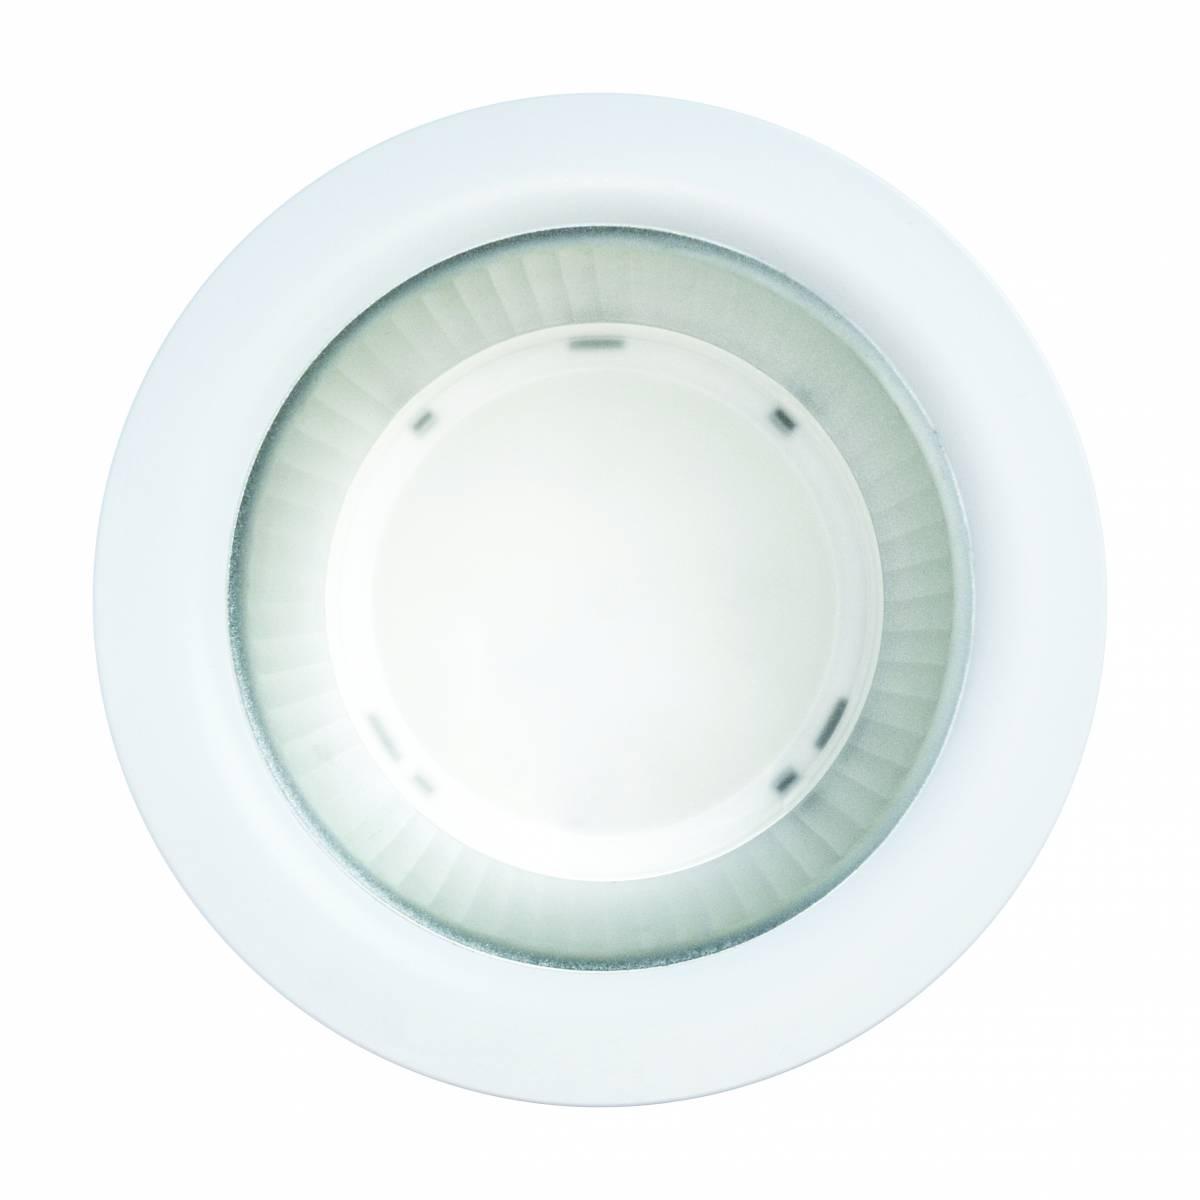 Segon M LED 170 ECO 13W 1000lm 830 ECG IP44 white